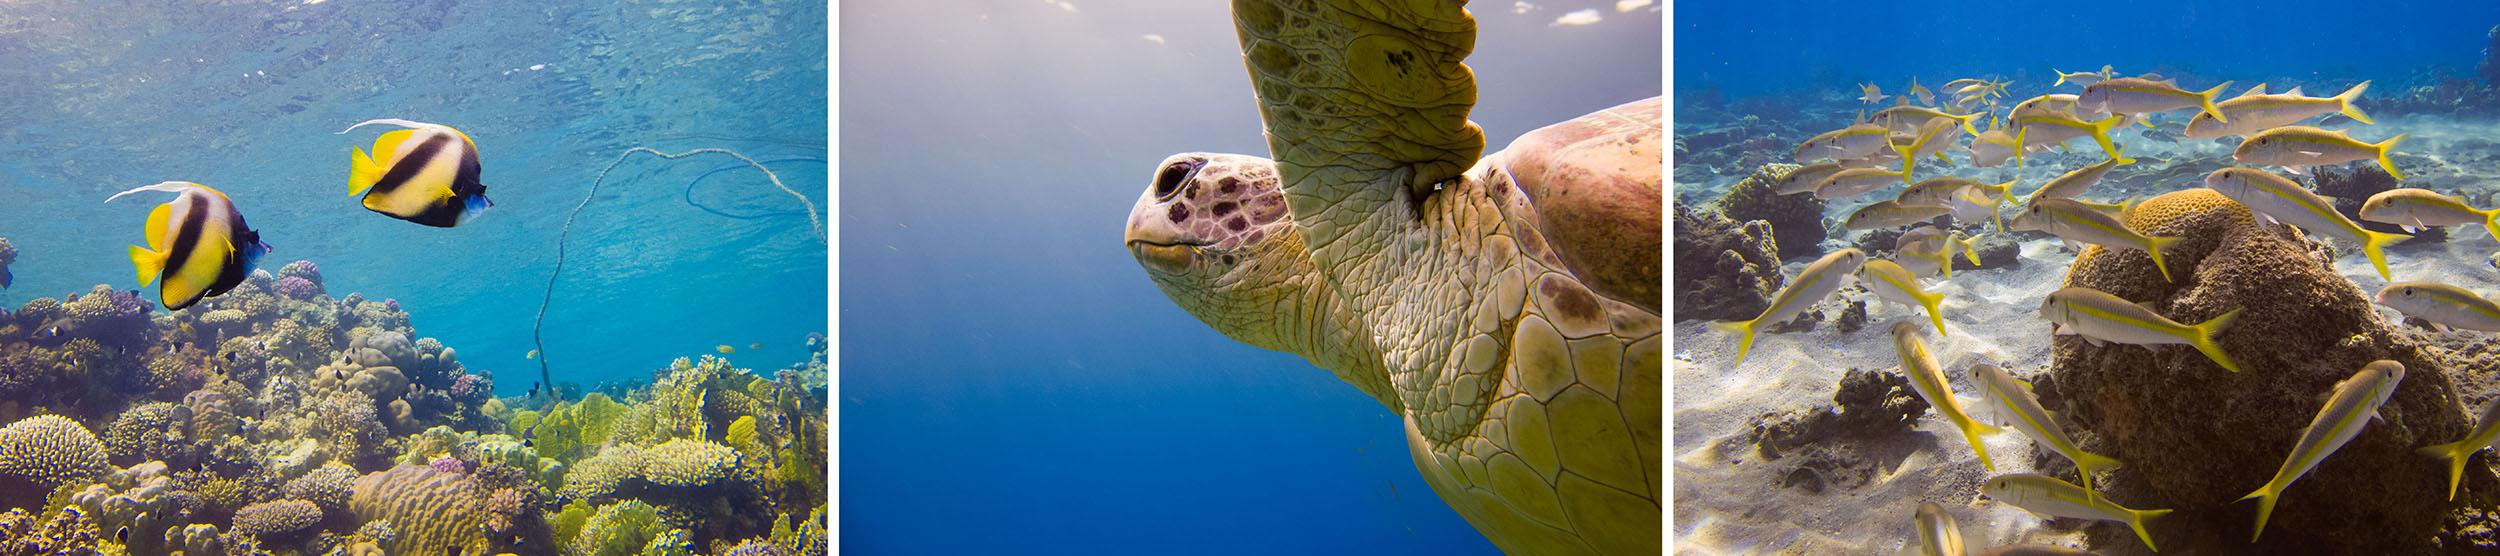 Drieluik onderwaterfotografie